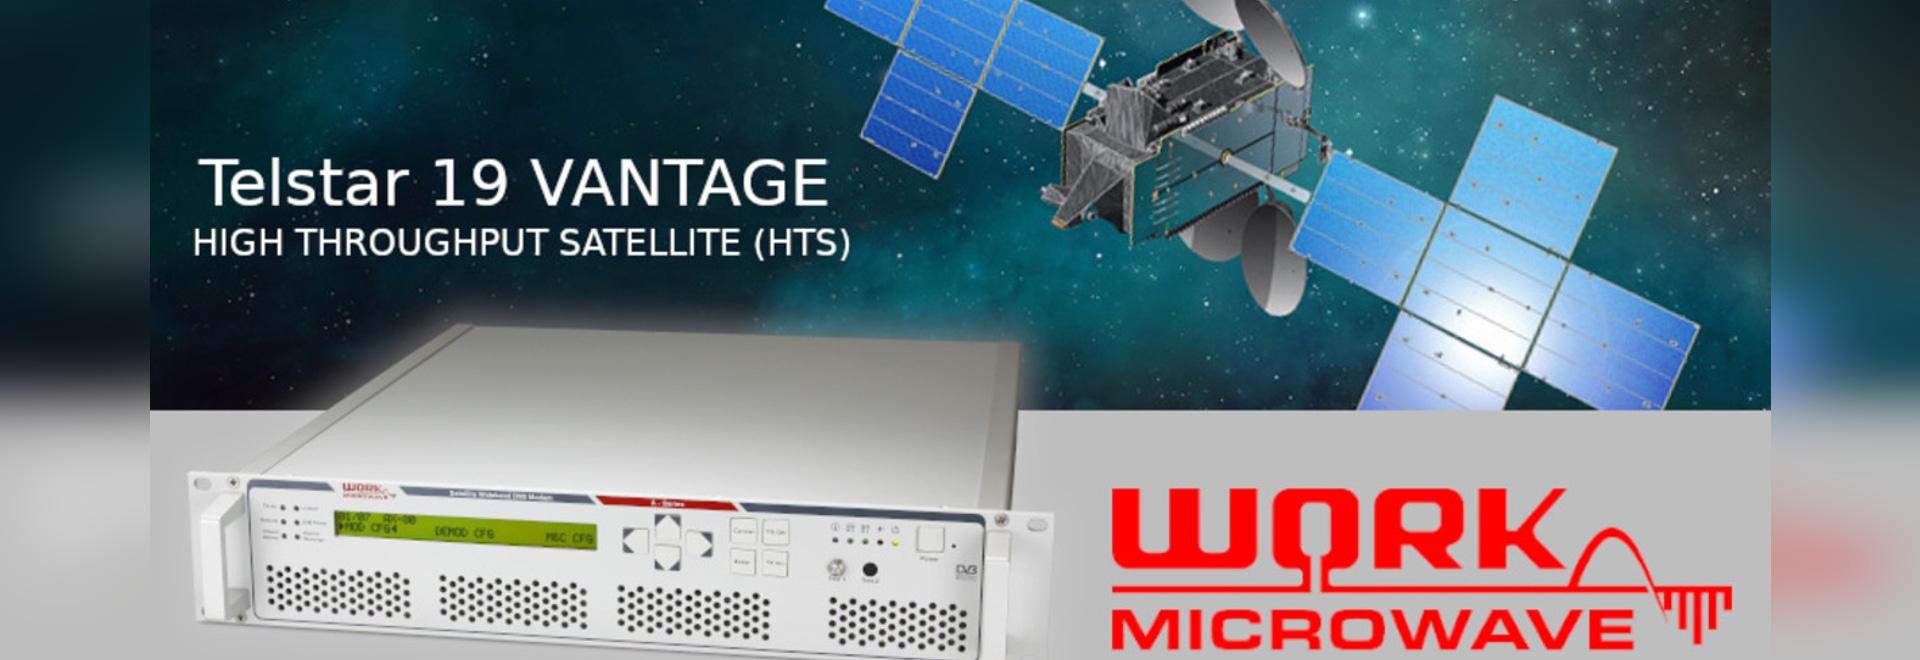 WORK Microwave Transforms Maritime SatCom